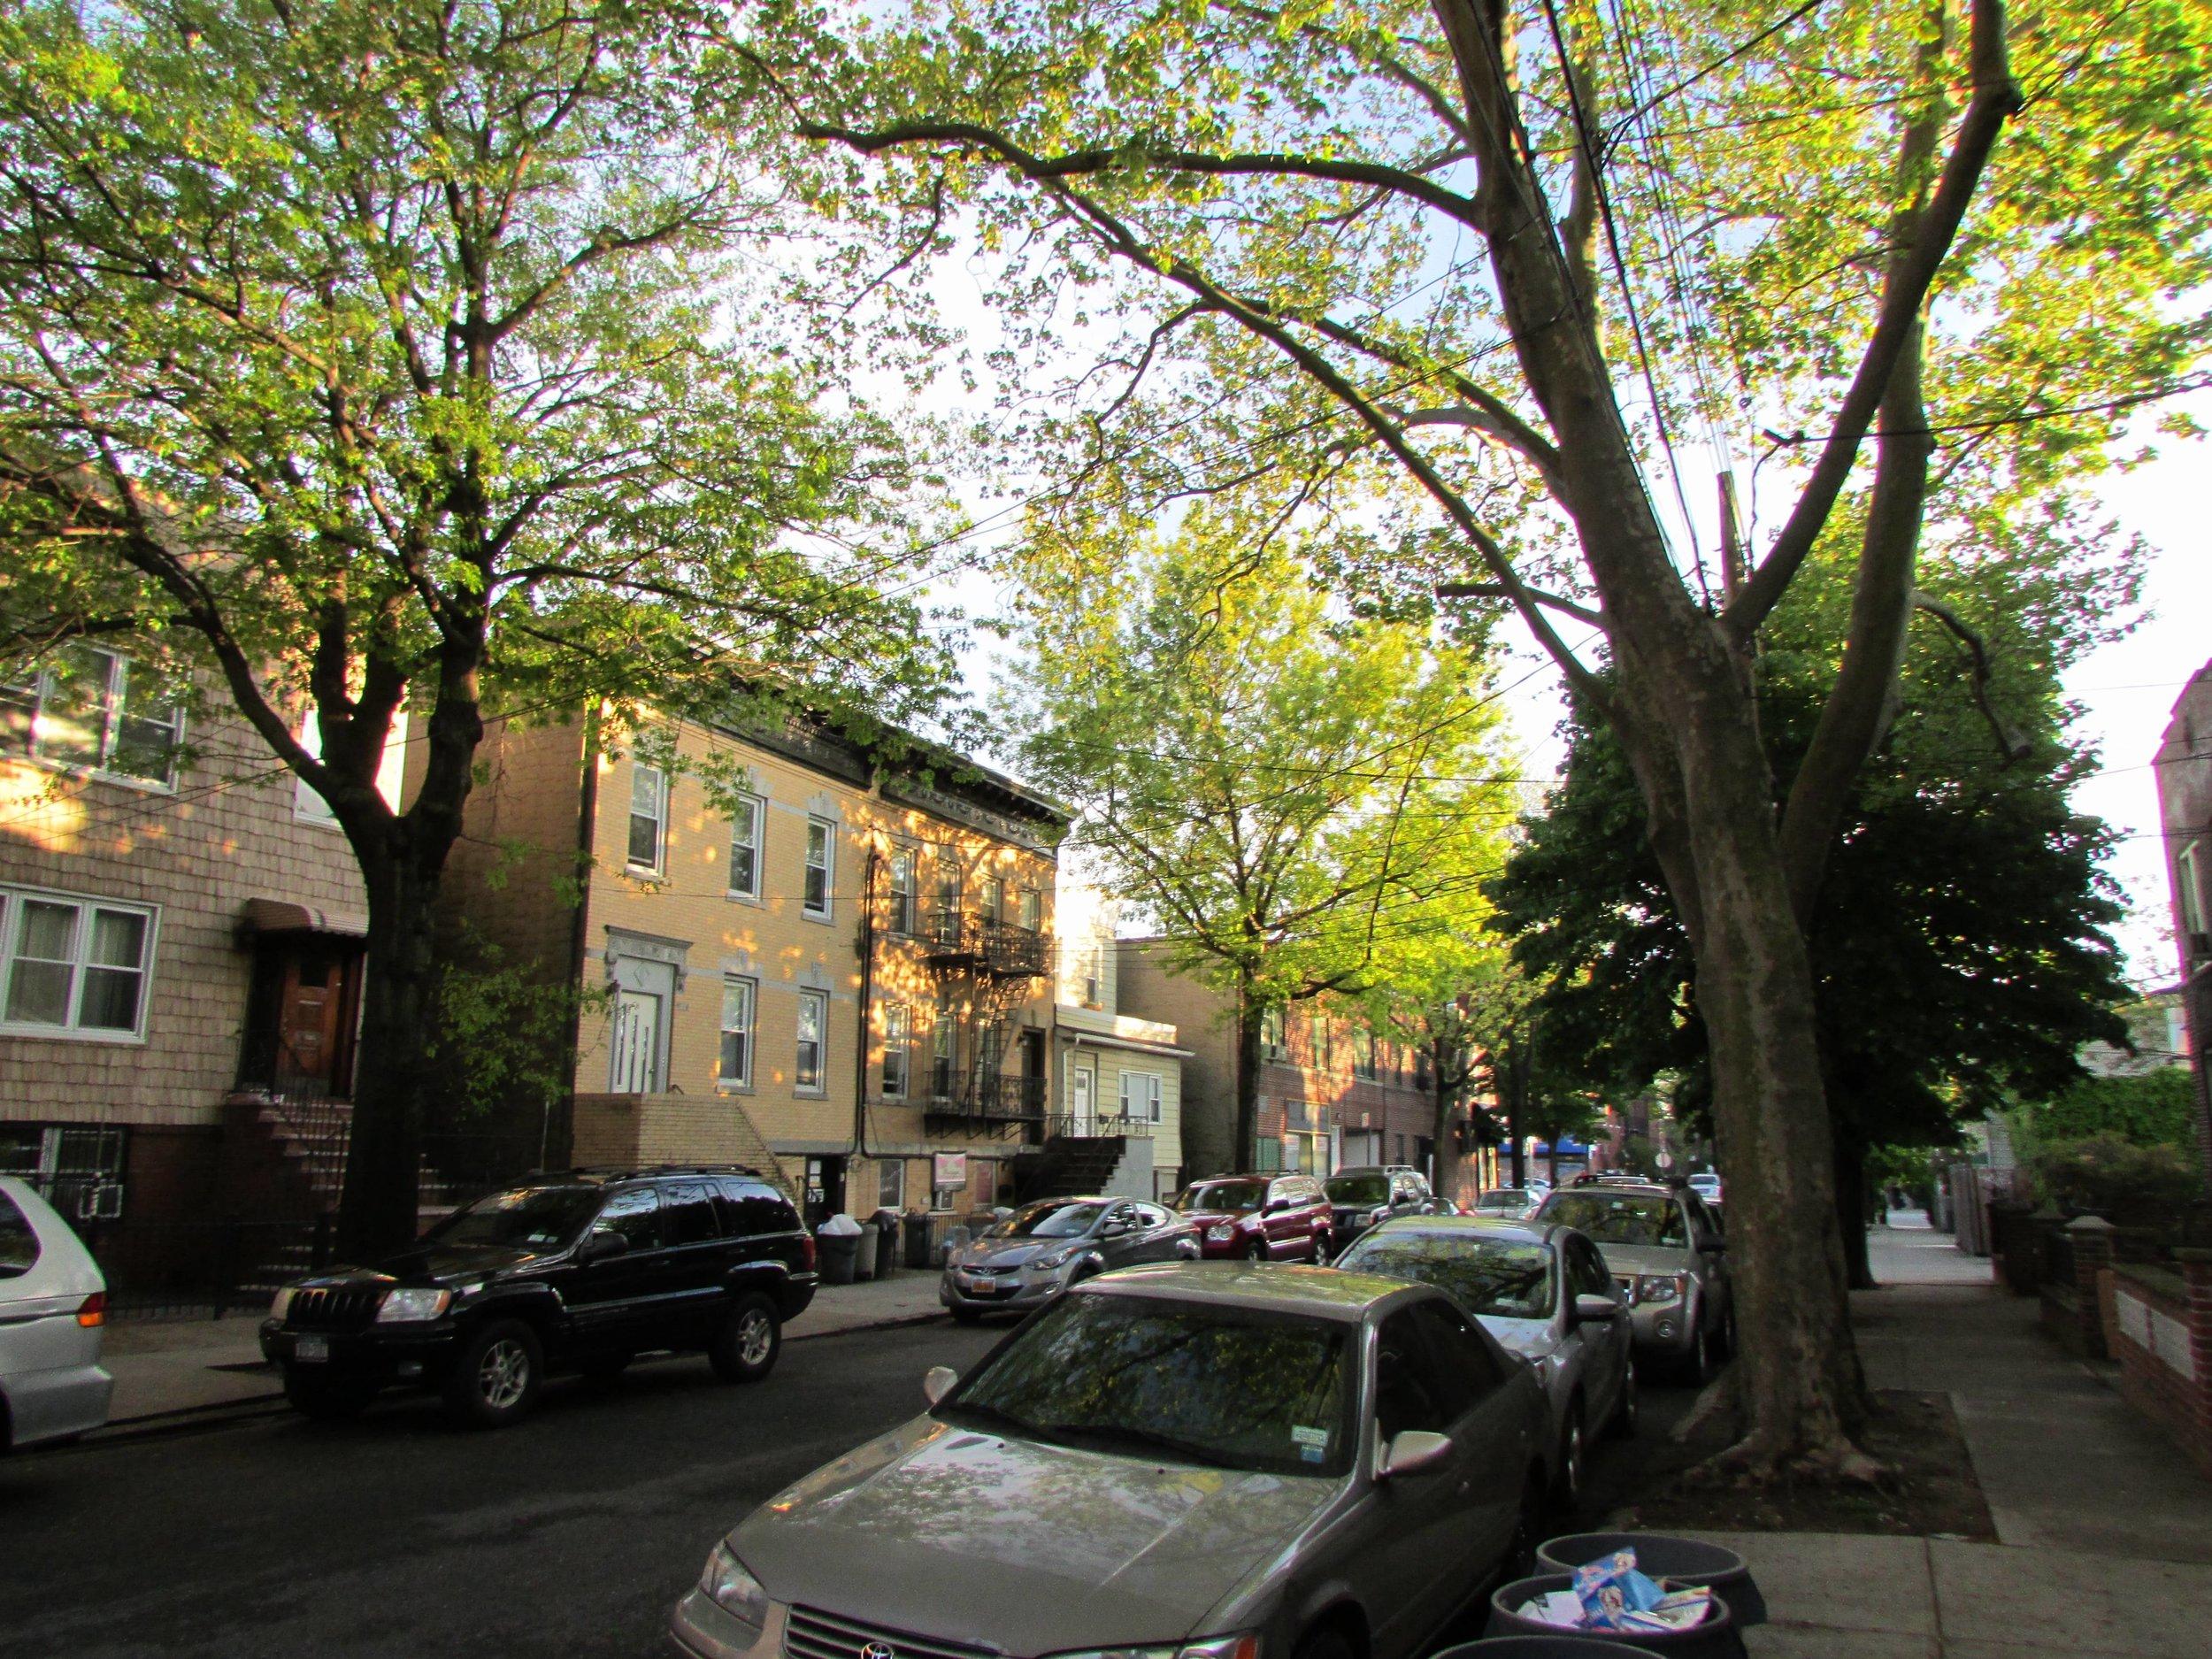 The suburban streets of Astoria, Queens